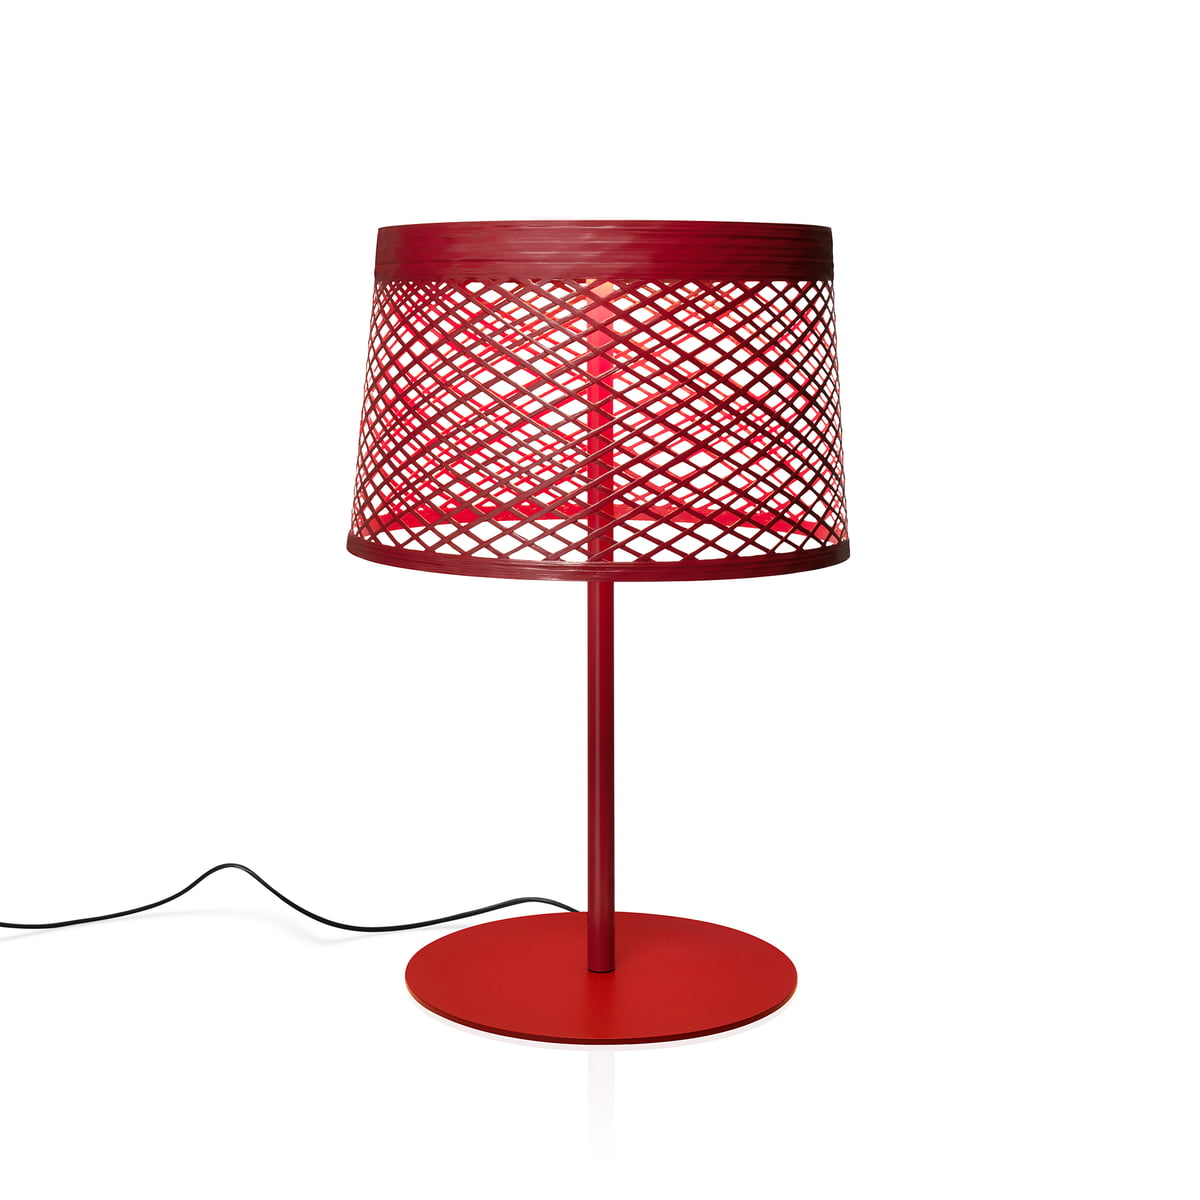 Twiggy LedCarmin Table Grid De Foscarini Lampe Xl dCBroxe